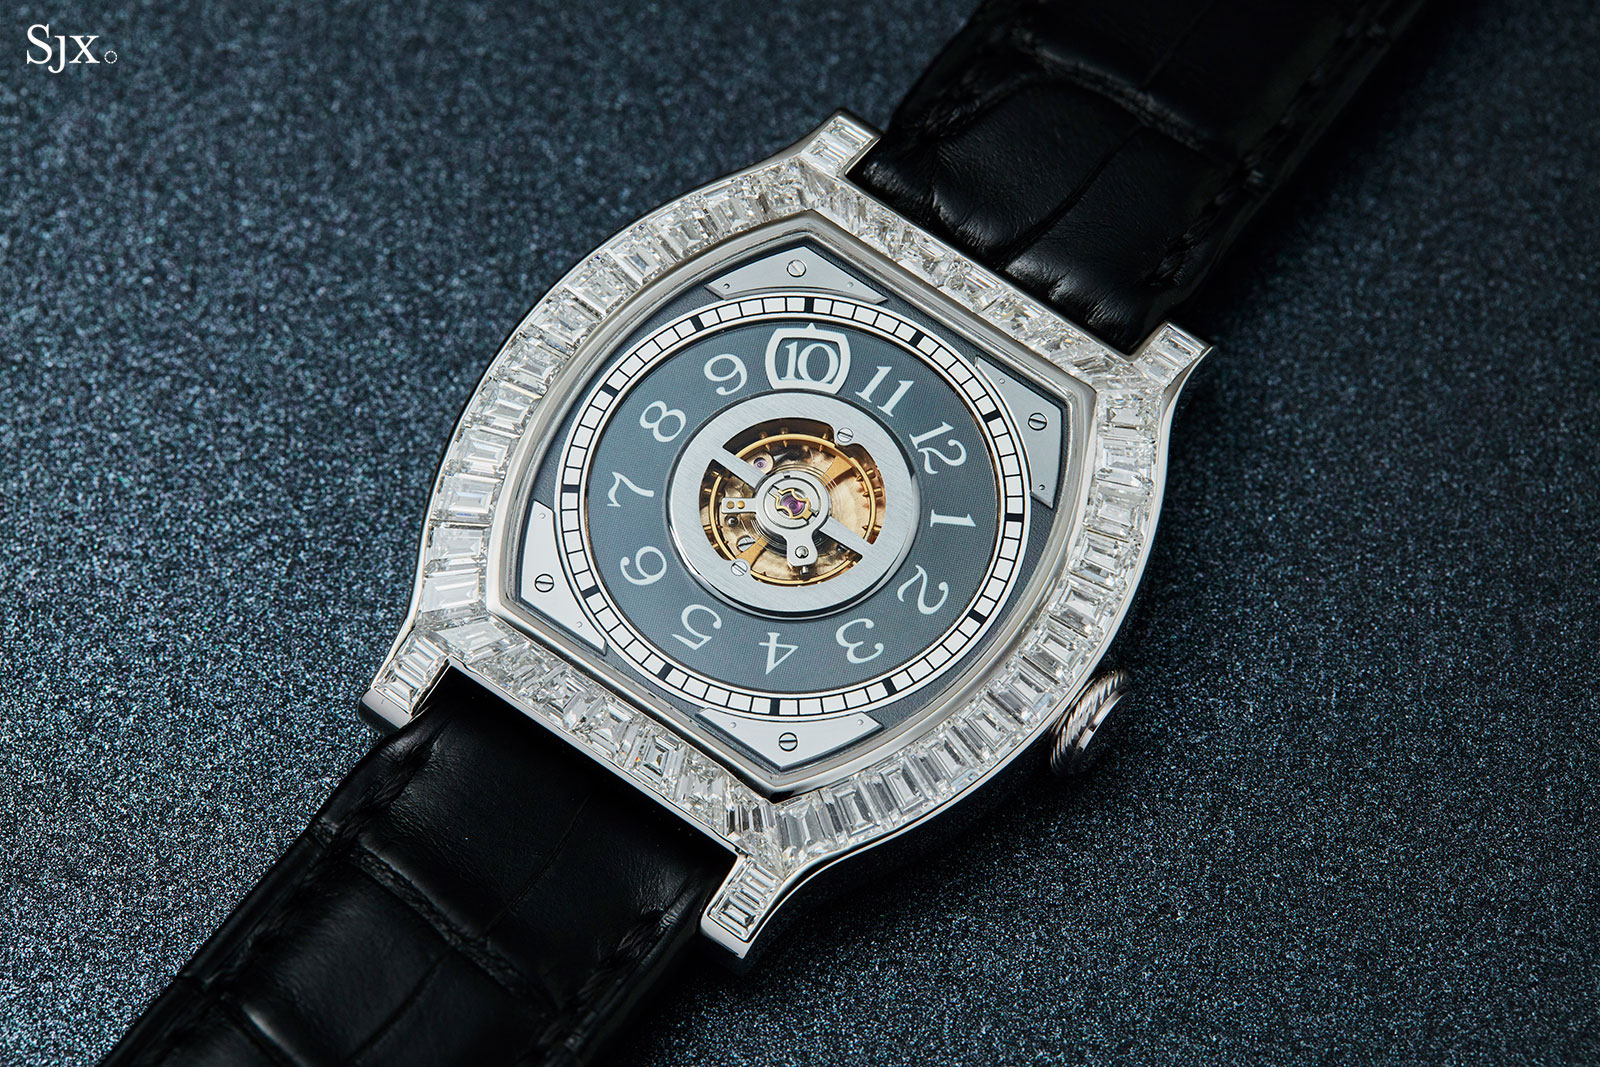 FP Journe Vagabondage I diamonds 3